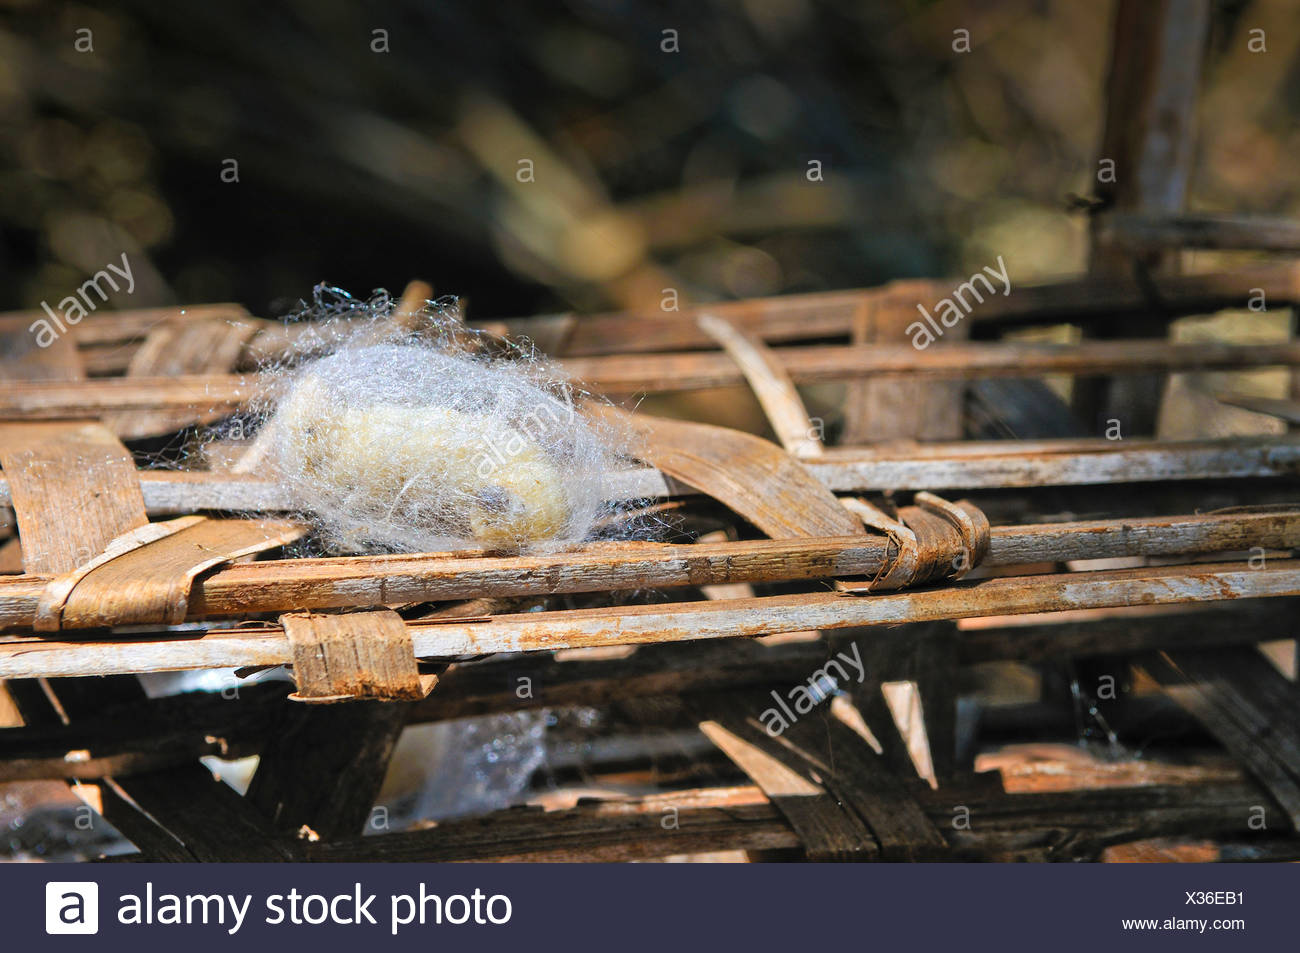 A silkworm (Bombyx mori) spins itself into a cocoon, sericulture, silk farming, Dalat capital, Central Highlands, Vietnam, Asia - Stock Image